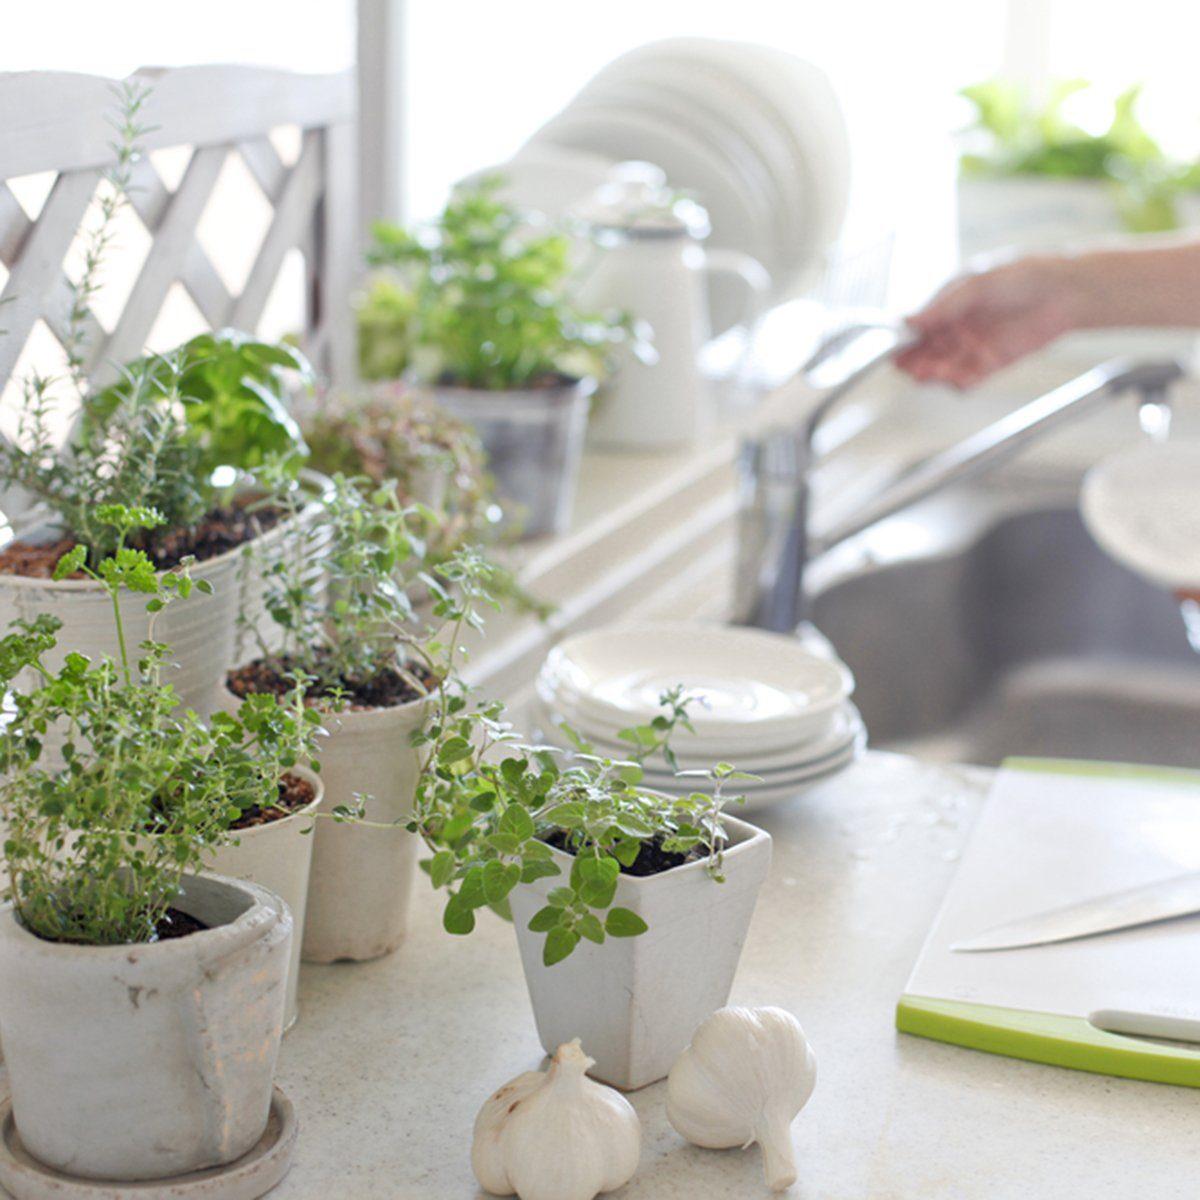 Herbs kitchen garden and woman; Shutterstock ID 159418133